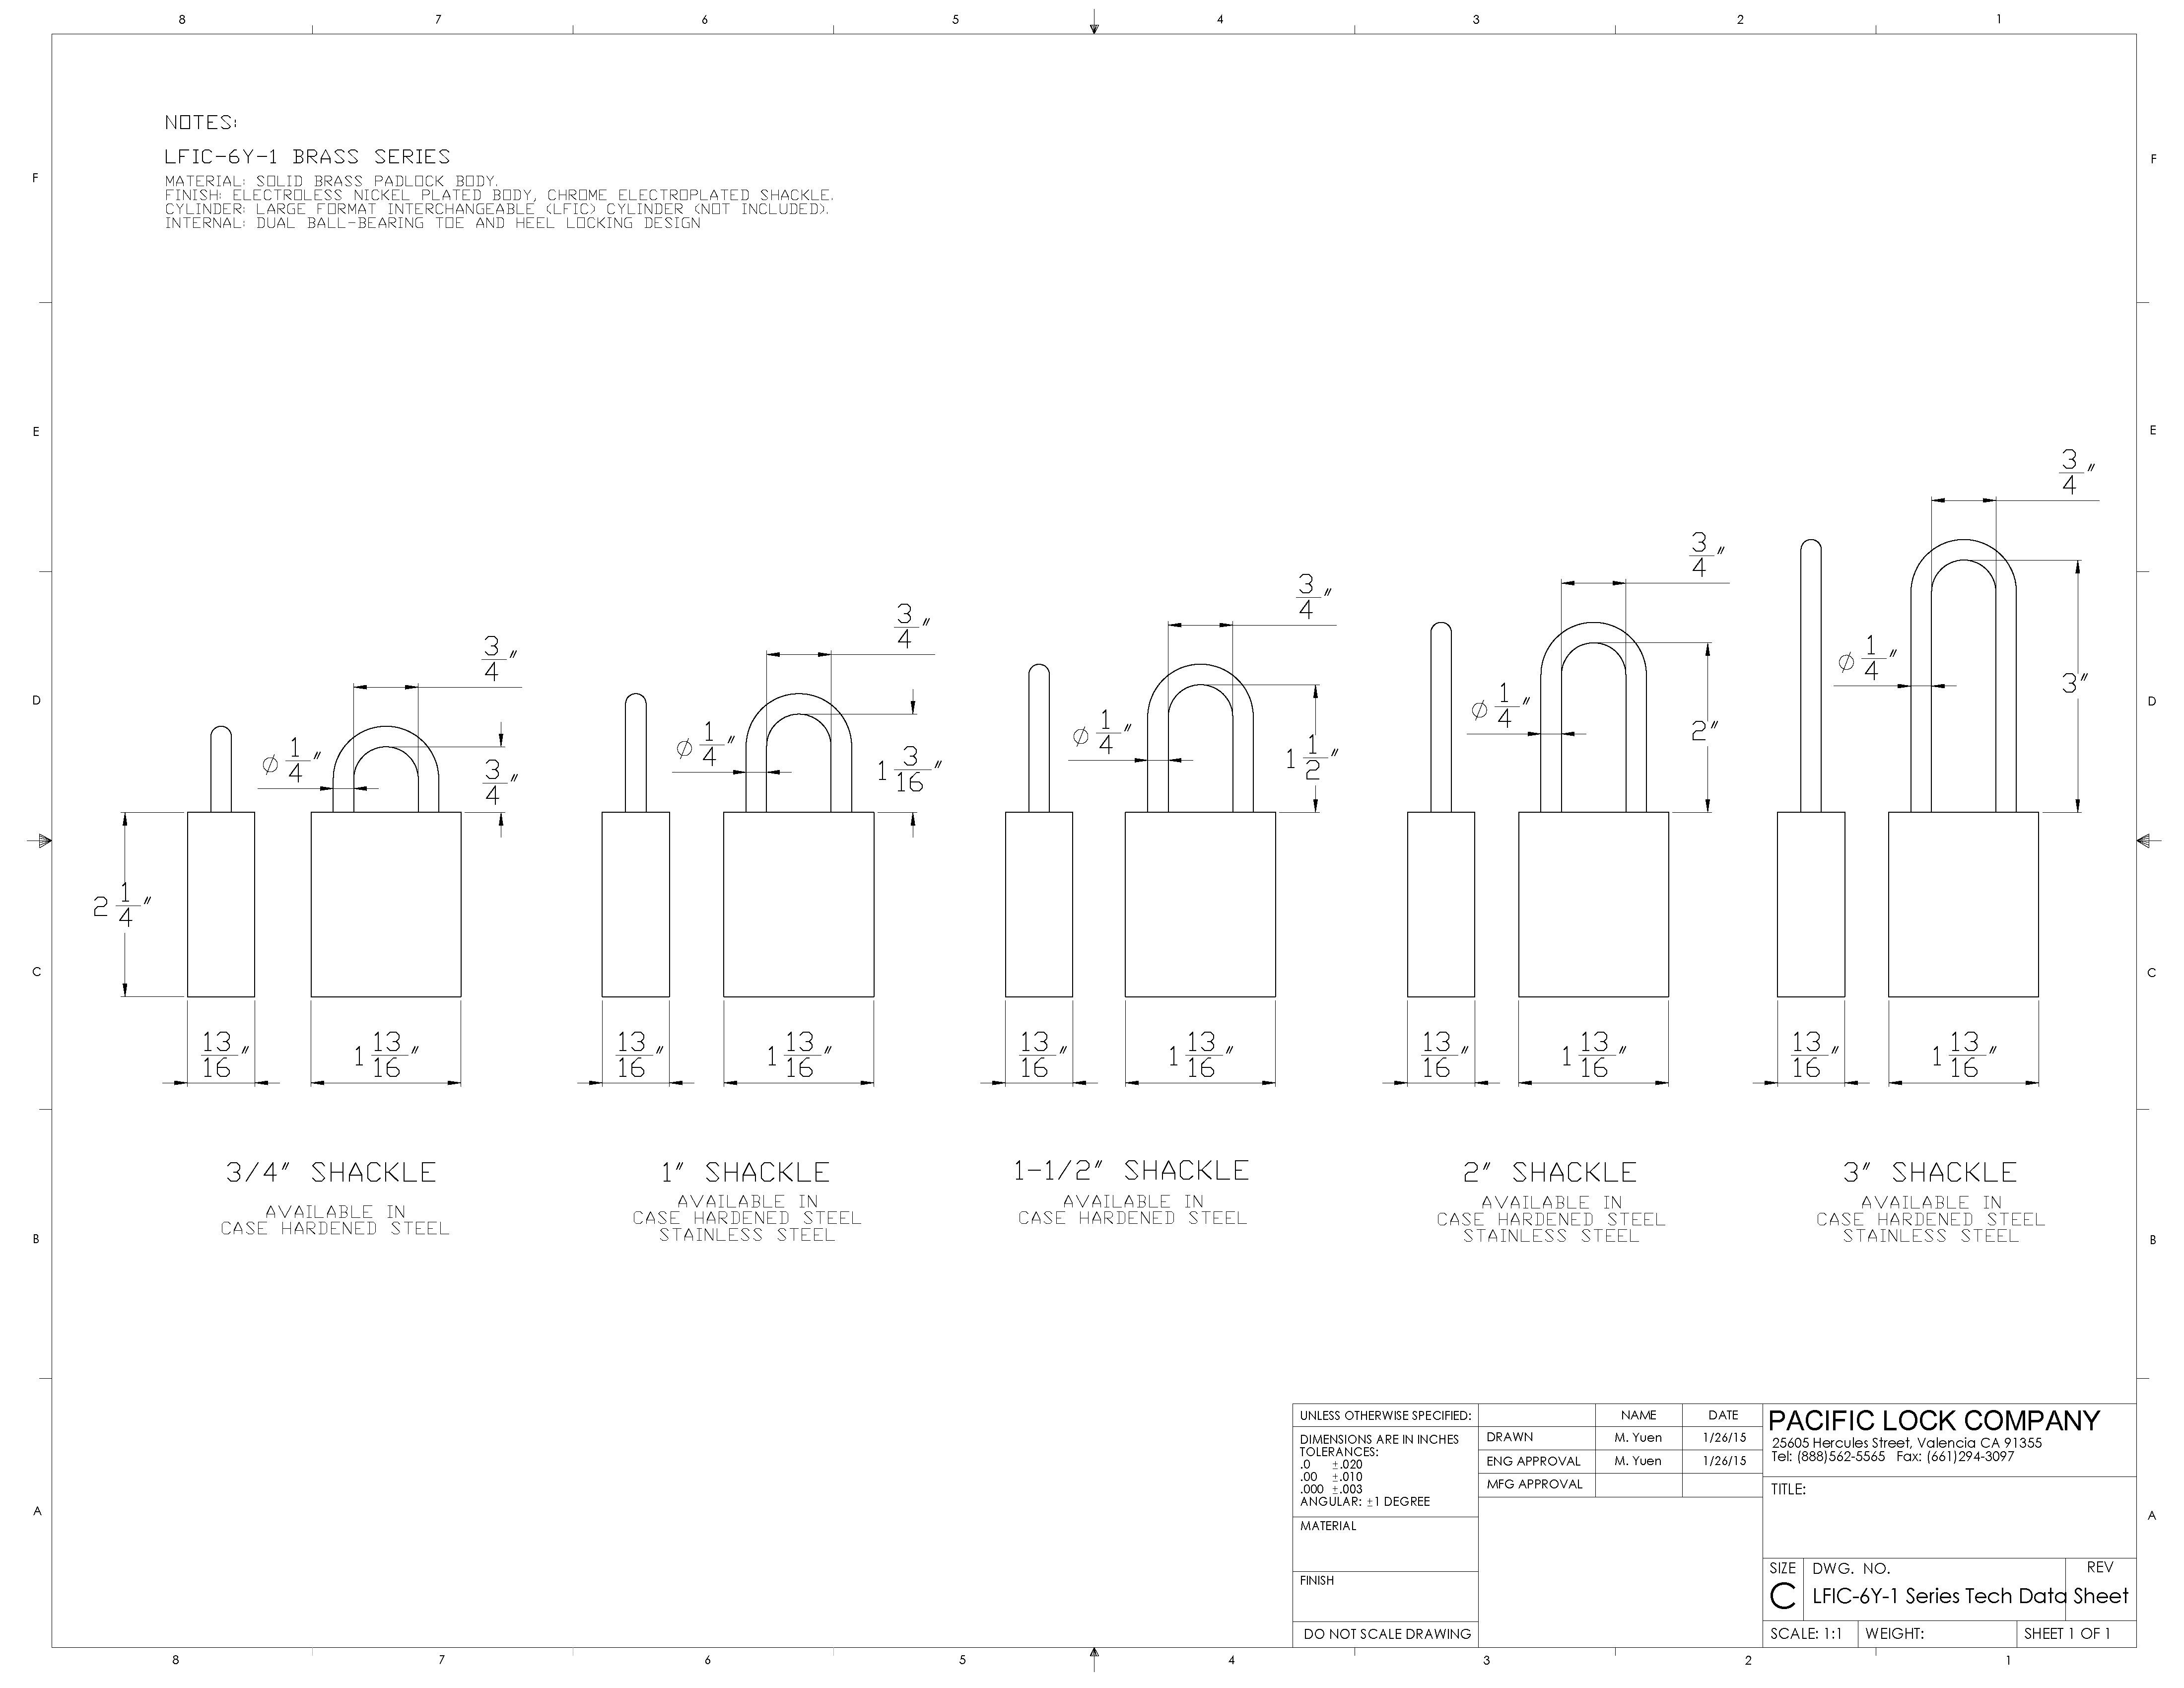 PACLOCK LFIC-Y6-1 Series Data Sheet